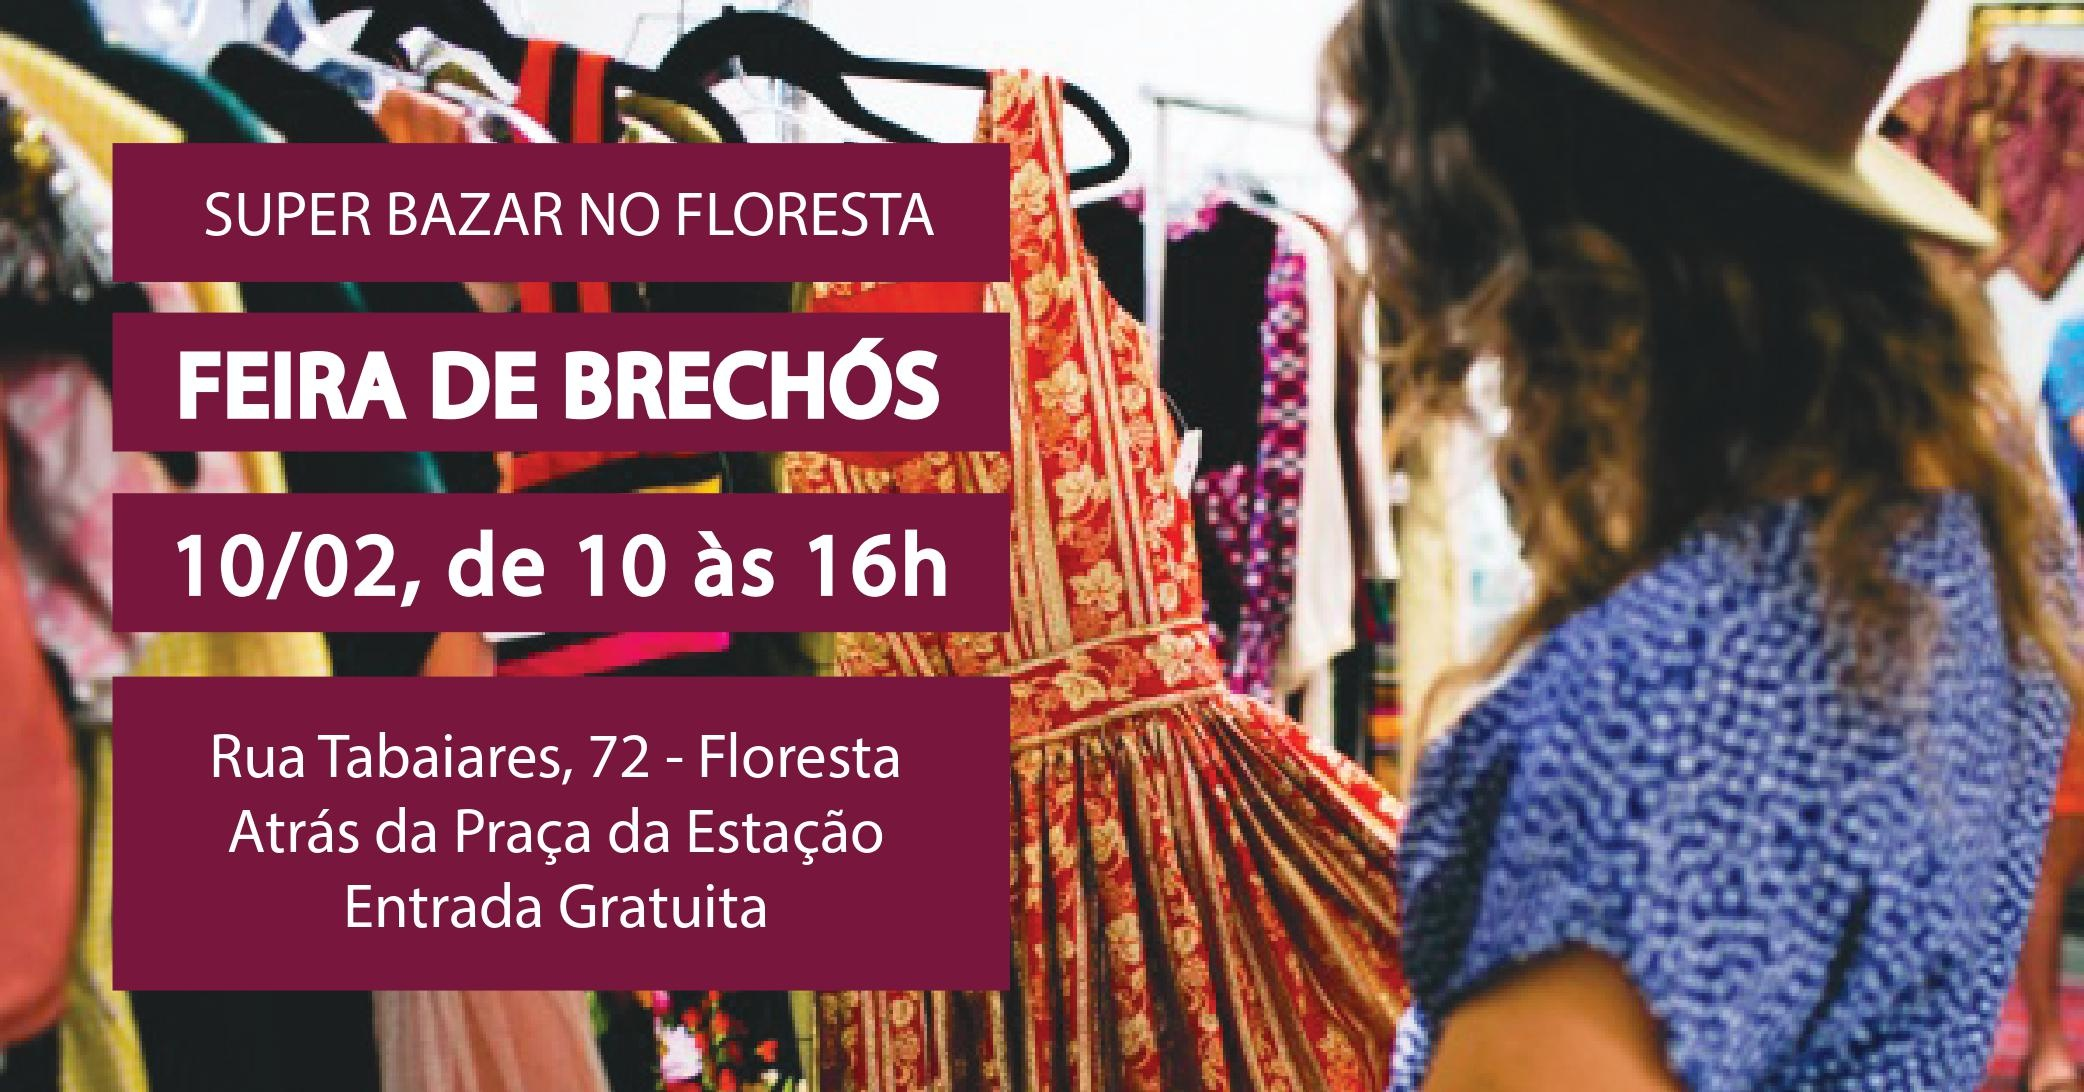 f14e1fdad Super Bazar: Feira de brechós no Floresta - Sympla